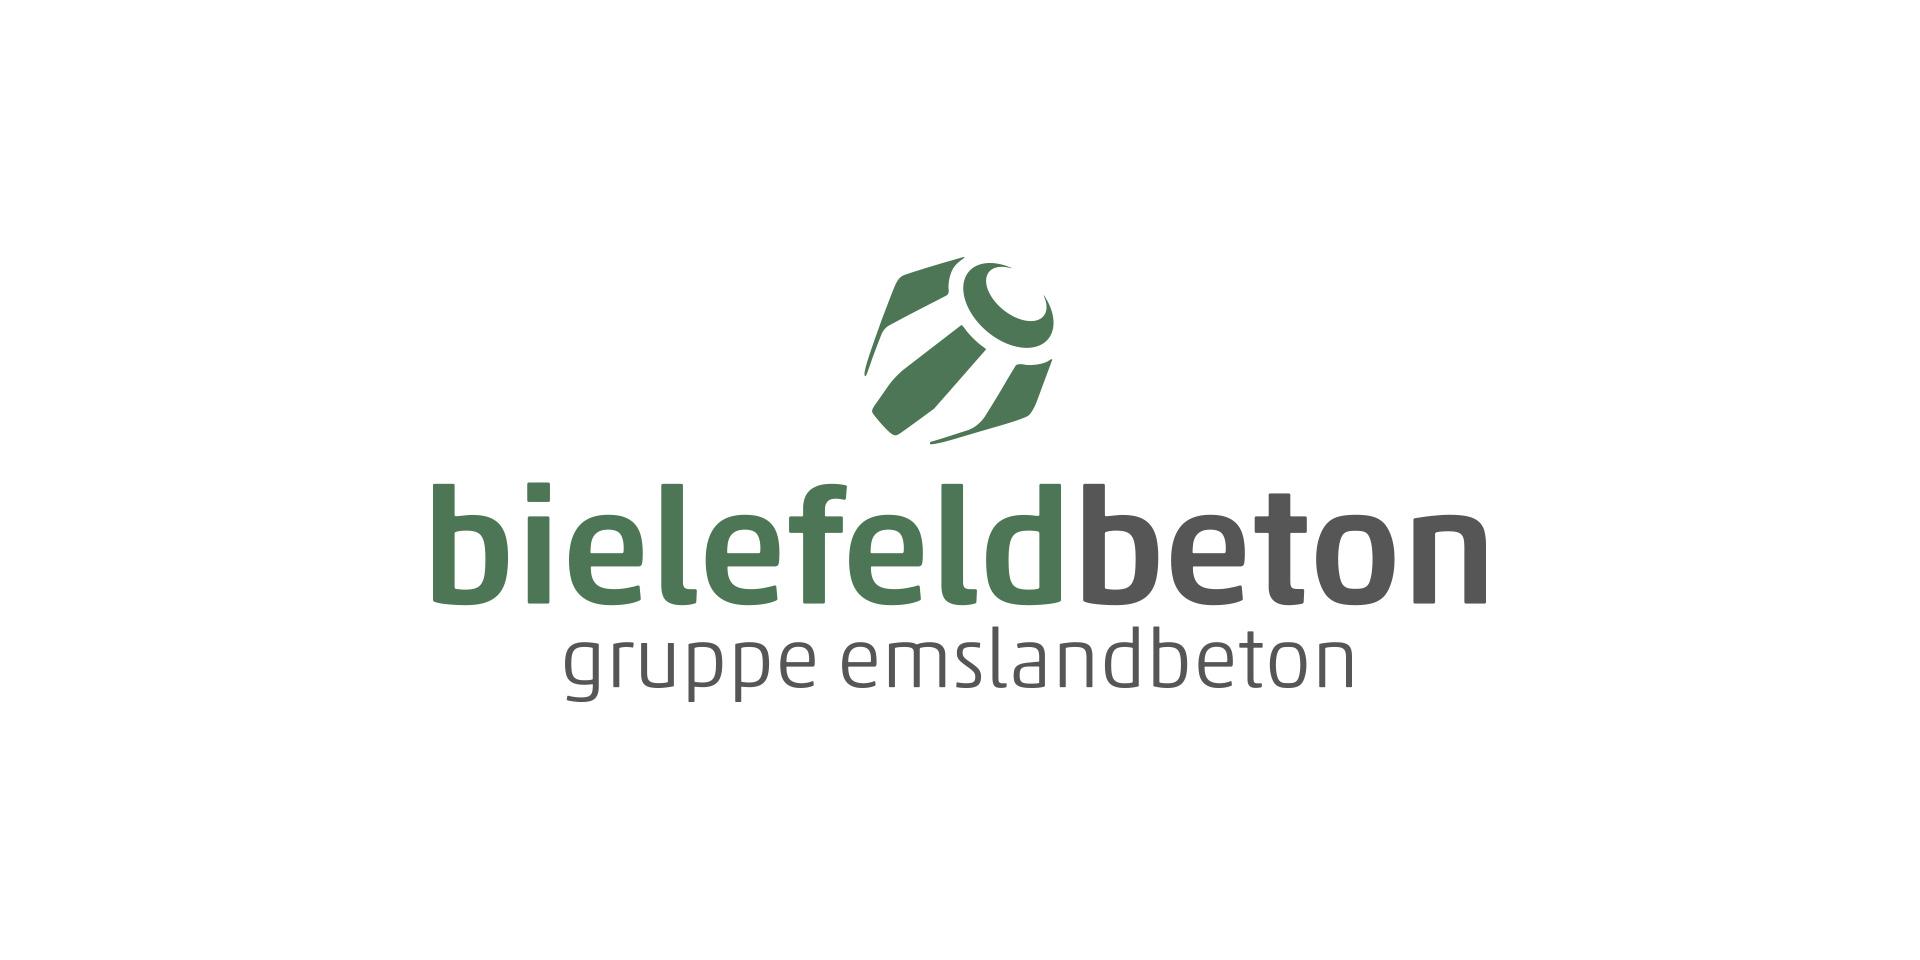 bielefeld beton Unternehmenslogo. André Morre Mediendesign